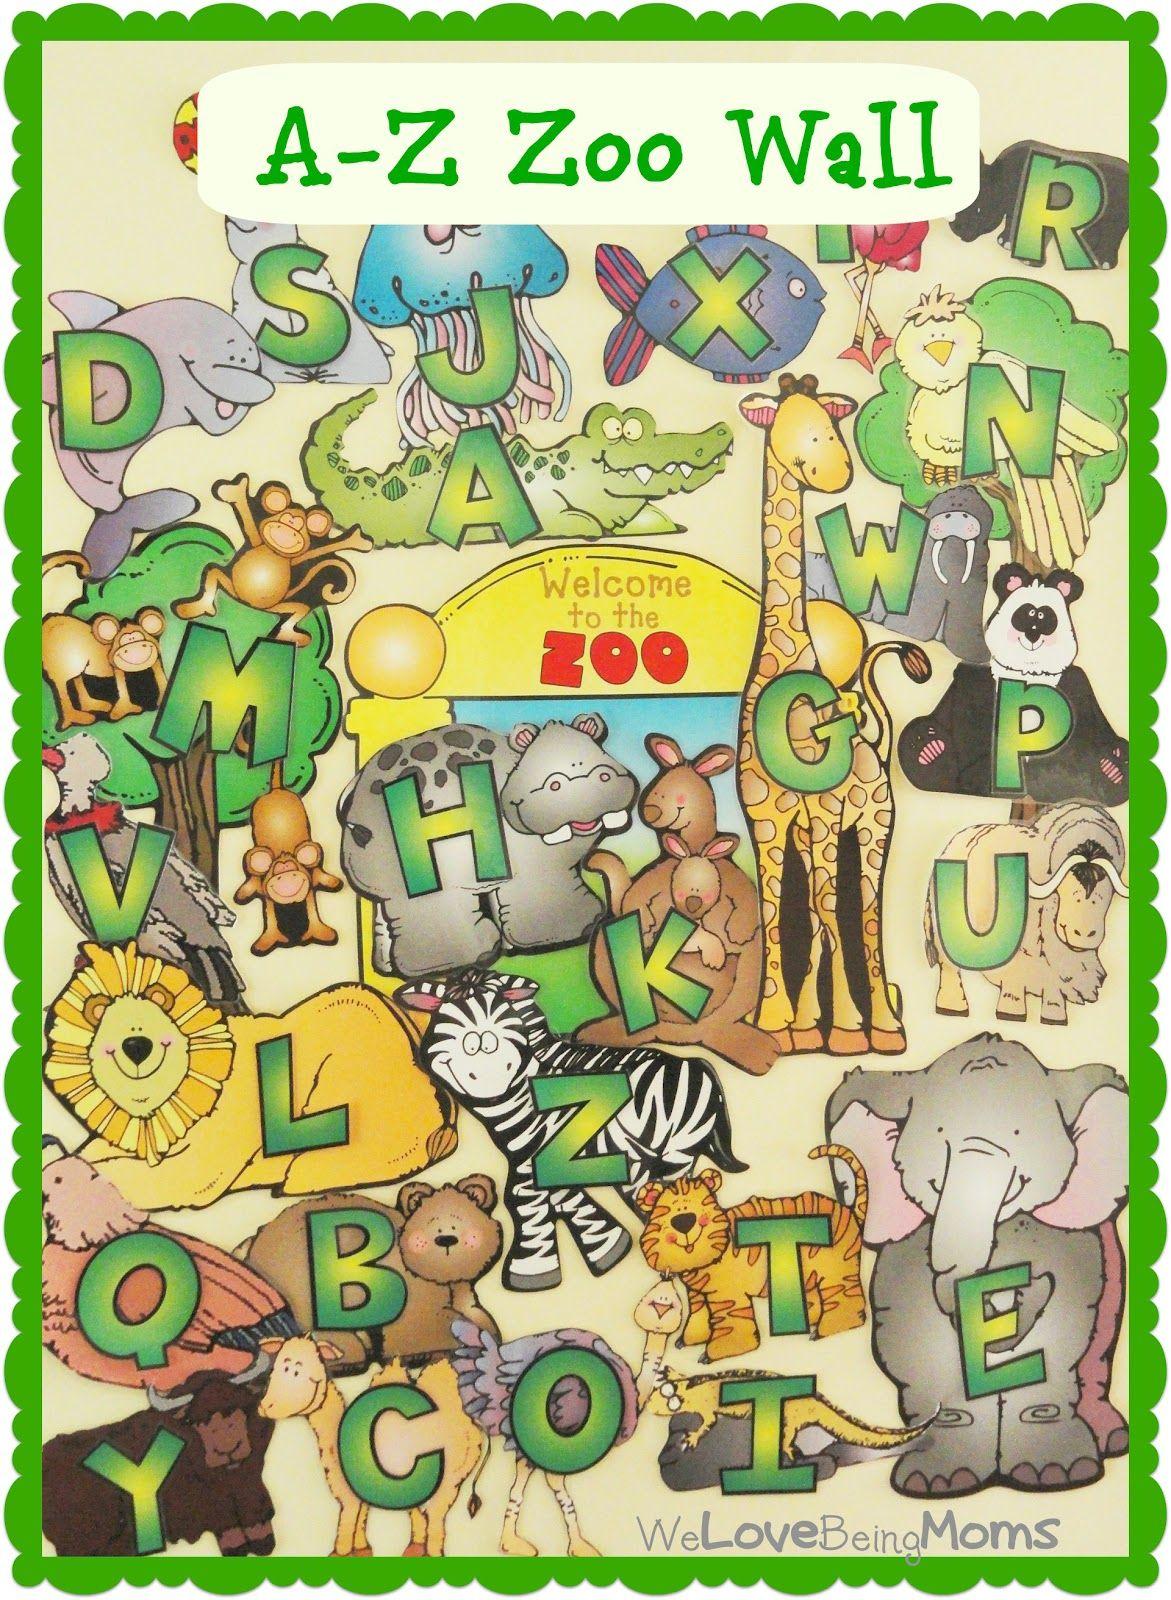 A Fun Way to Teach ABC's to Preschoolers AZ Zoo Wall